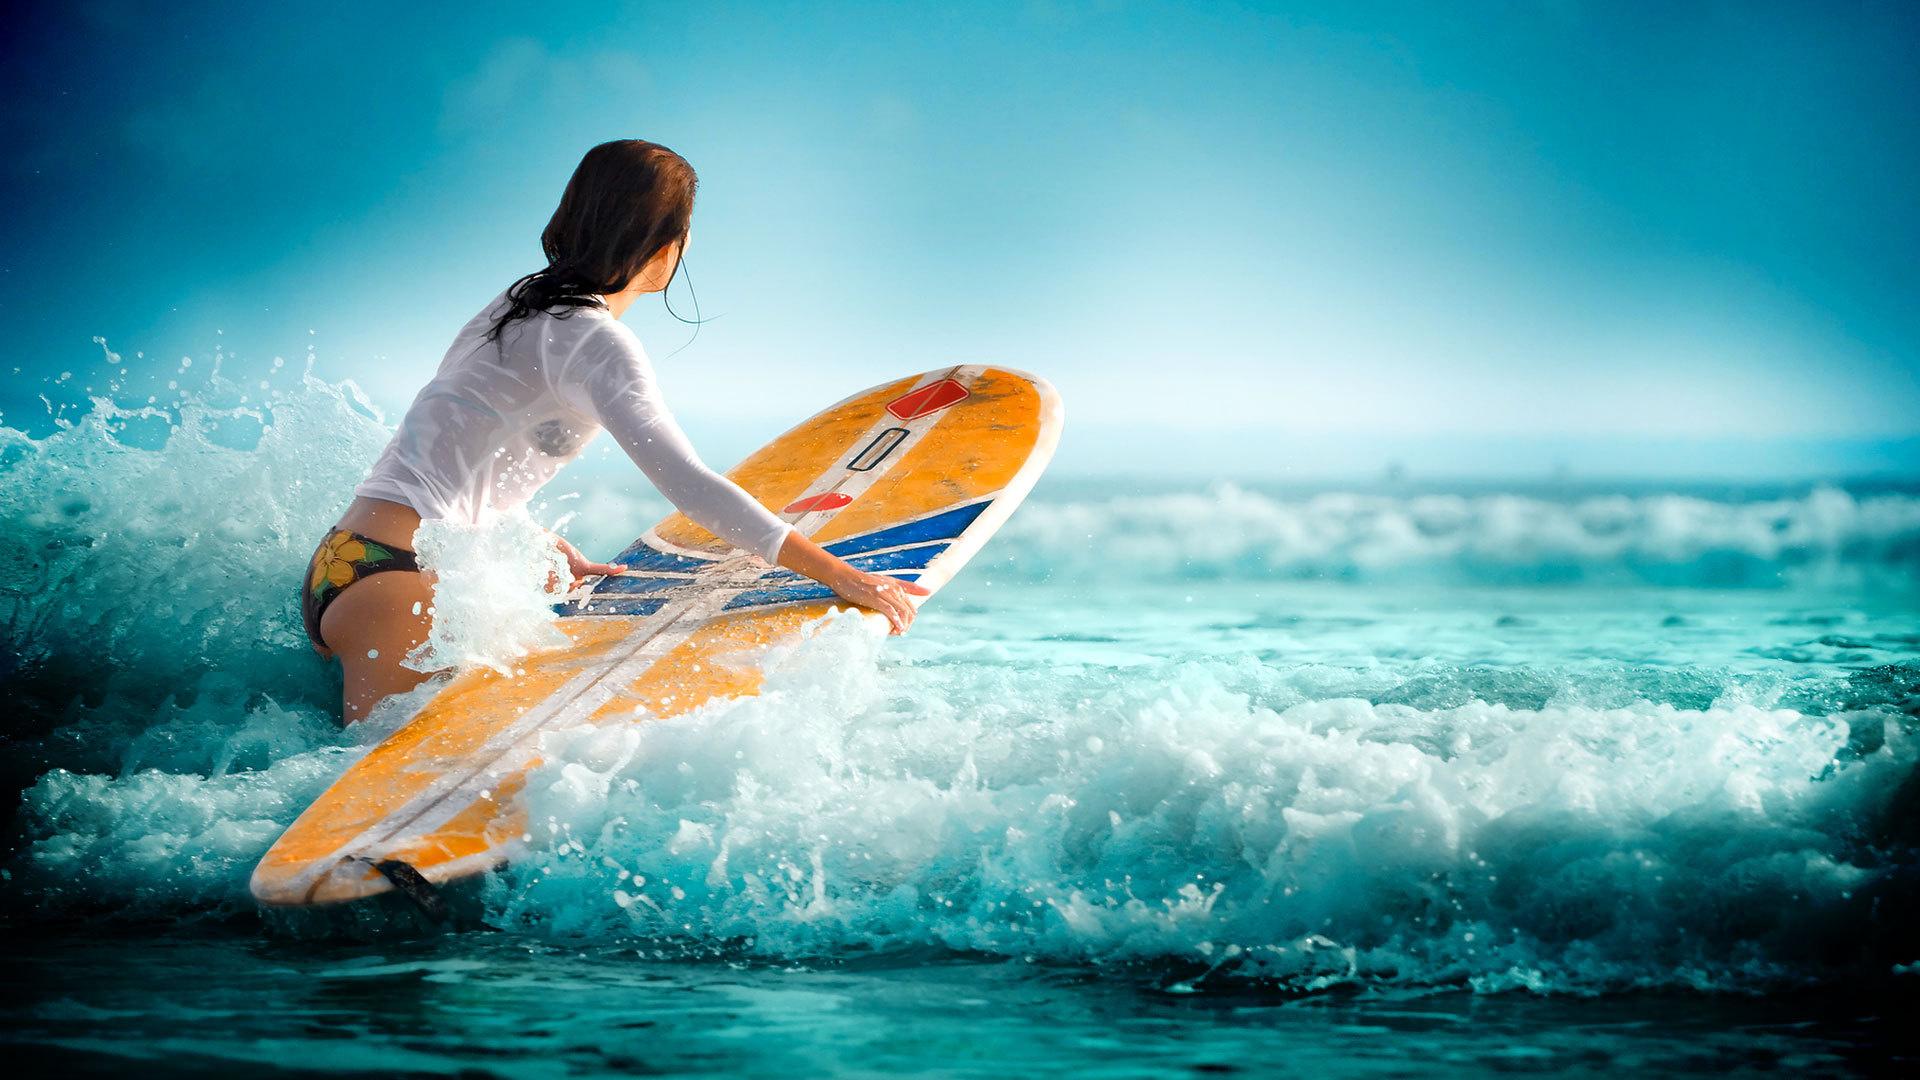 Surfing waves water sea girl wallpaper 1920x1080 117562 1920x1080